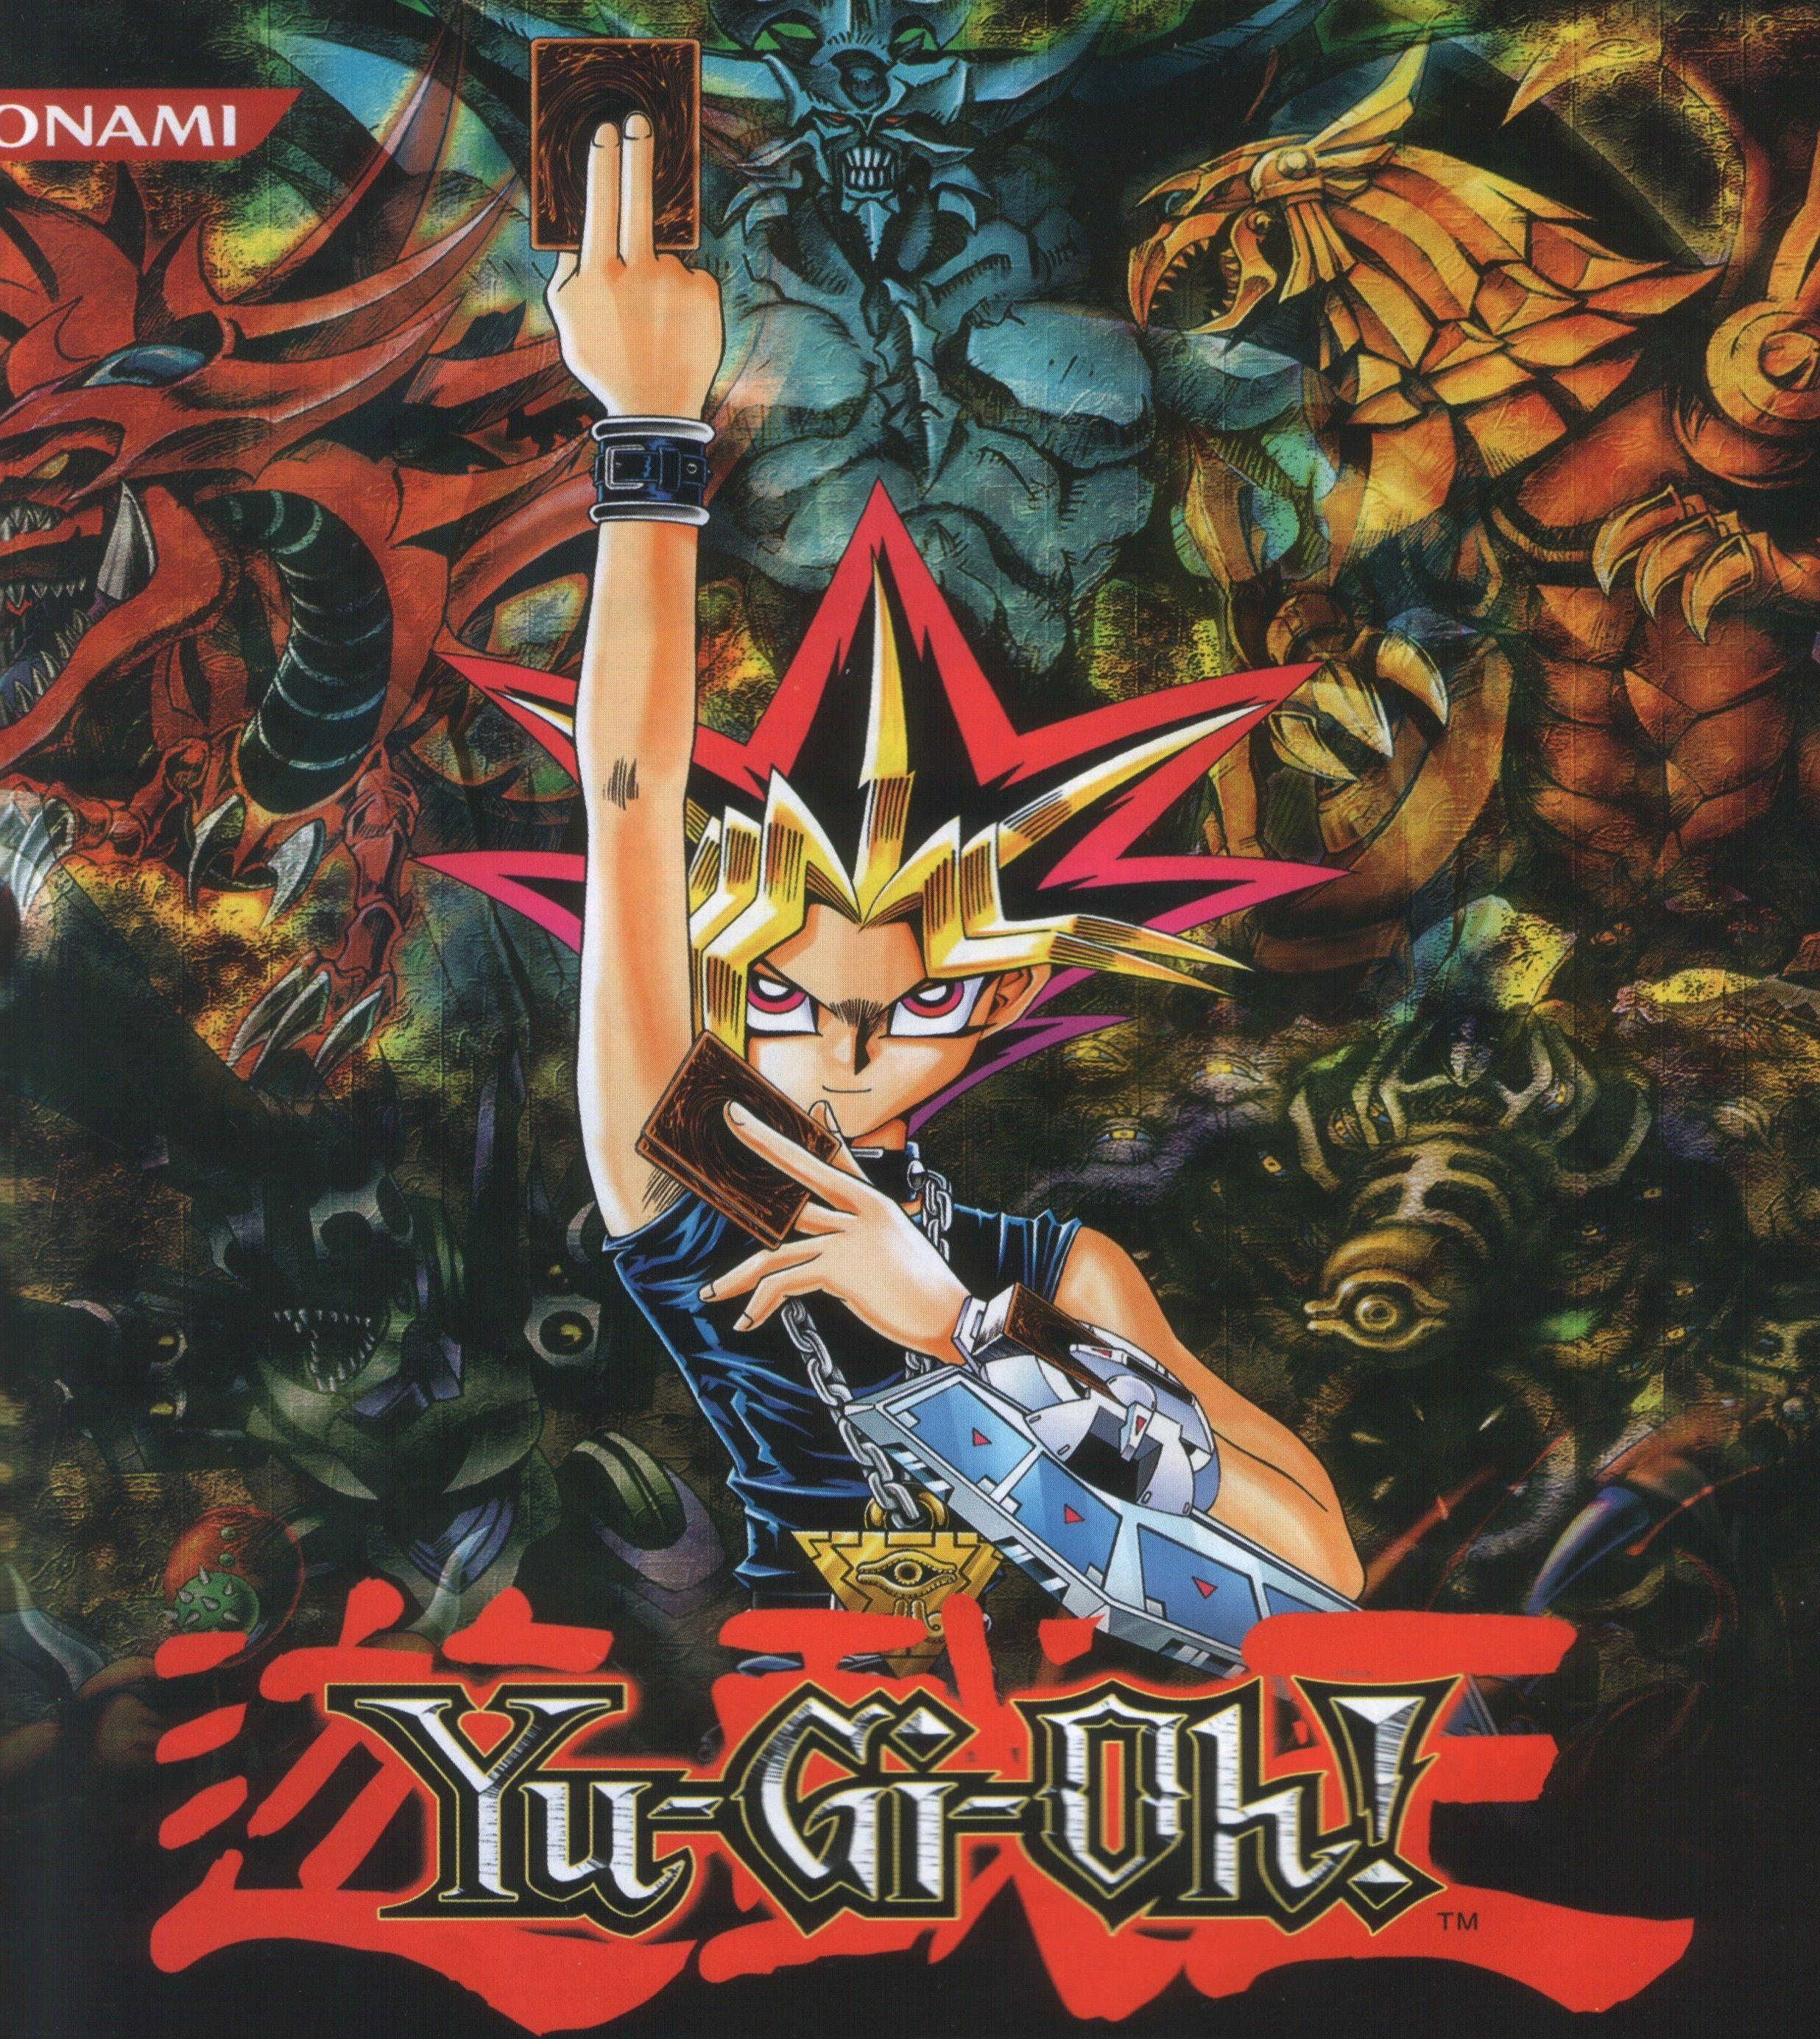 Takahashi Kazuki Yu Gi Oh Duel Monsters Yu Gi Oh Obelisk The Tormenter The Winged Dragon Of Ra Slifer The Sky Dragon Yami Yugi Scan Poster Sour Yugioh